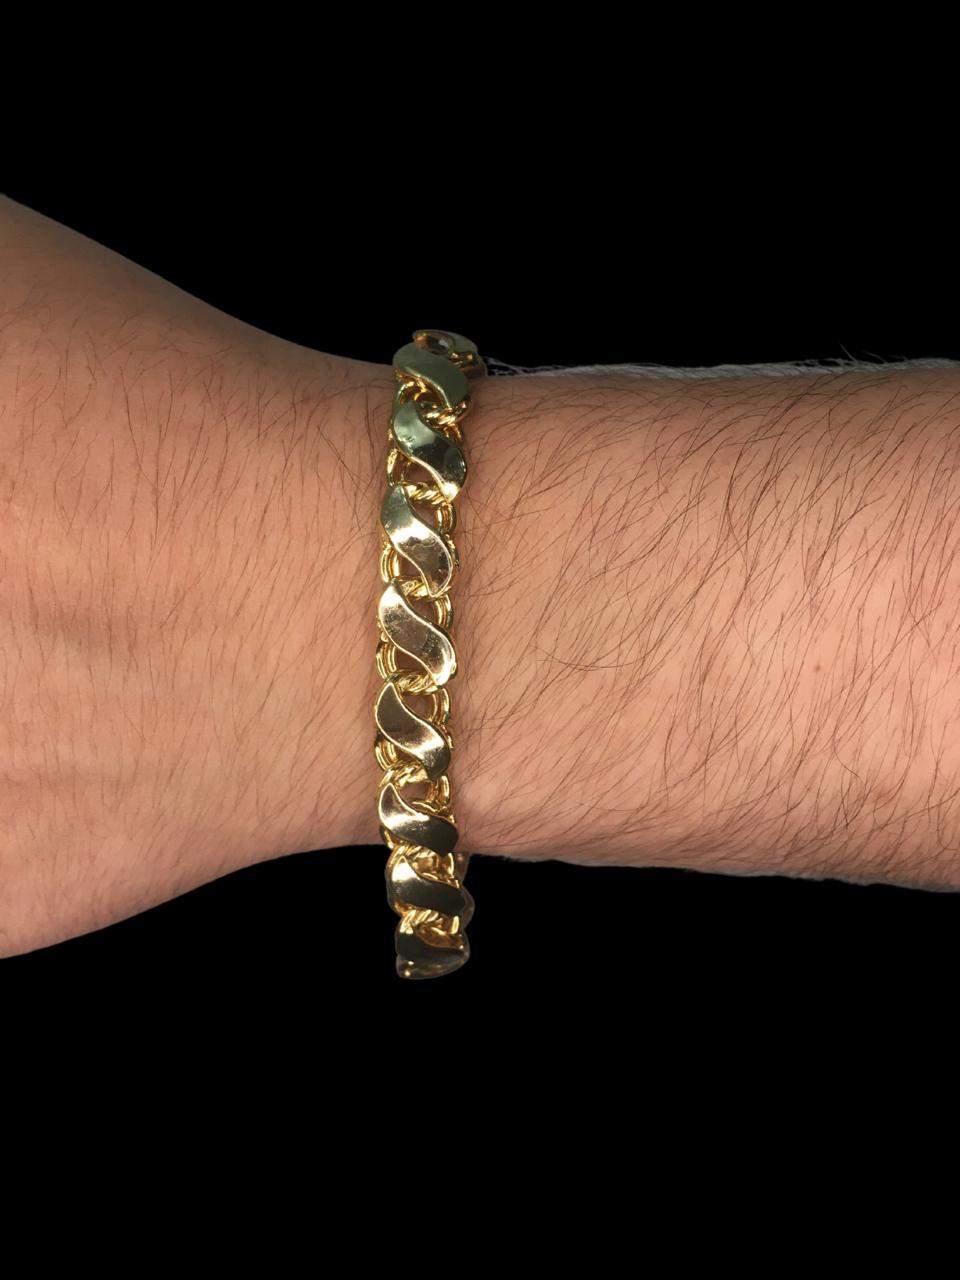 Pulseira friso S   -  9 milímetros - 22 Centímetros - fecho Gaveta - Banhado a ouro 18 k